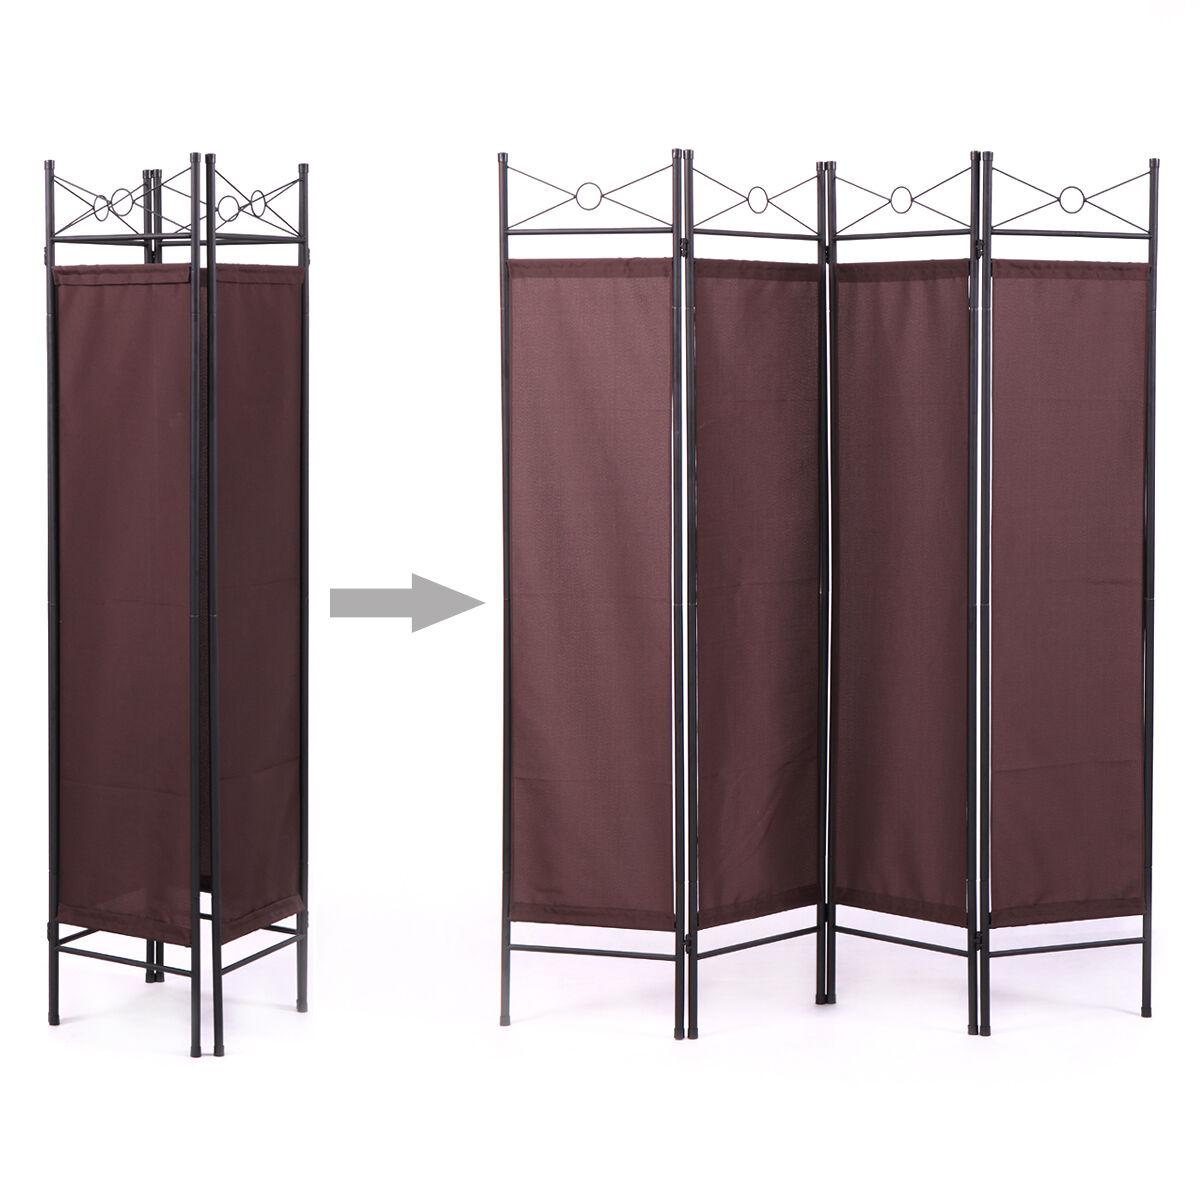 Folding Screen Room Divider 3 Panel Privacy Wood Home Frame Partition Dressing For Sale Online Ebay